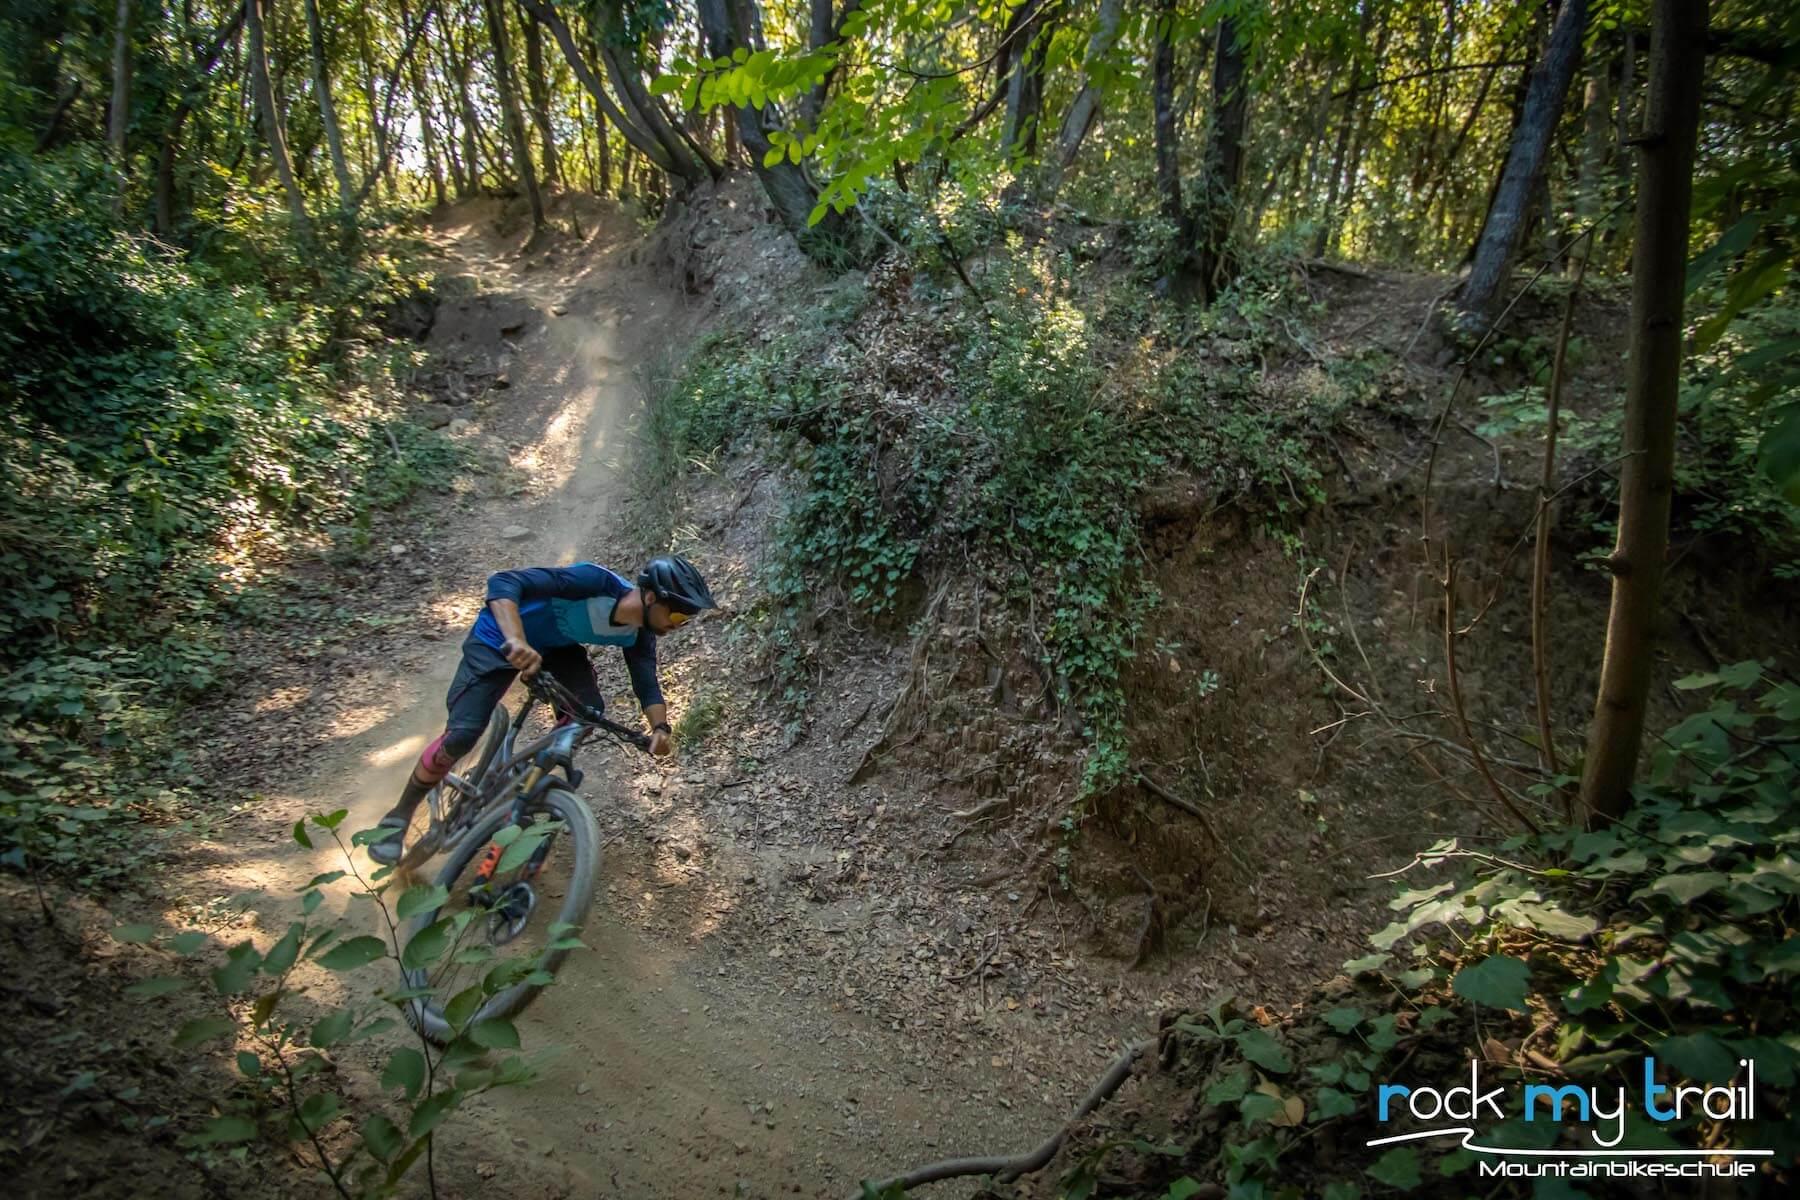 MTB Reise Toskana Trailparadies Bike Reise Paare. - Rock my Trail19